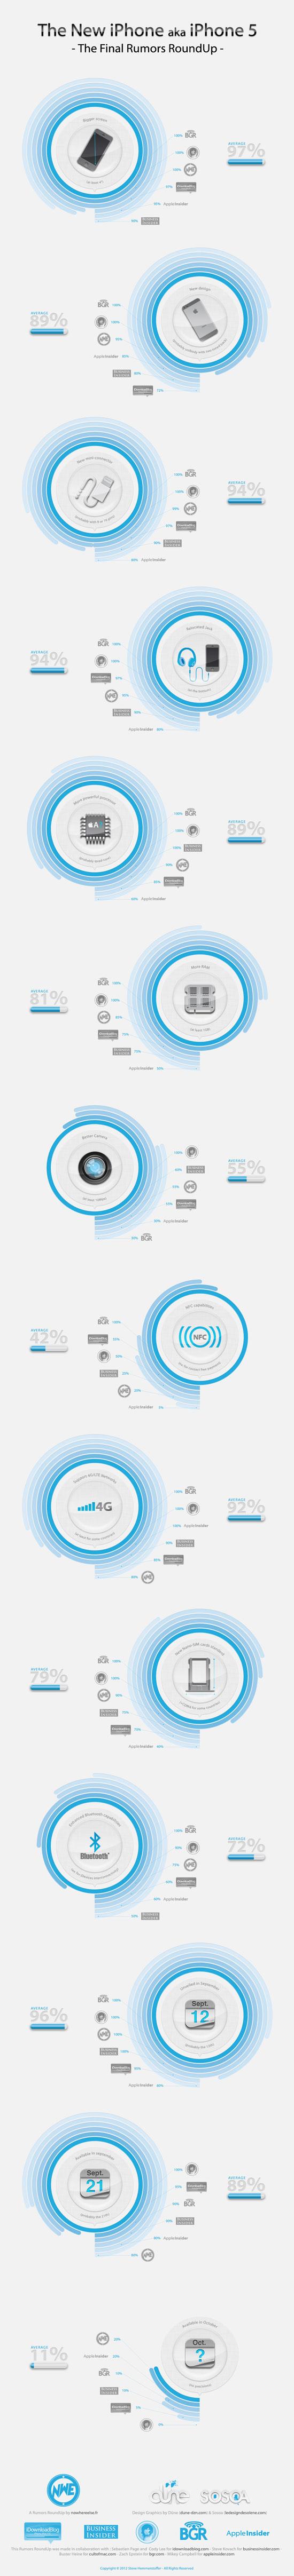 Infografik: iPhone-Gerüchtesammlung